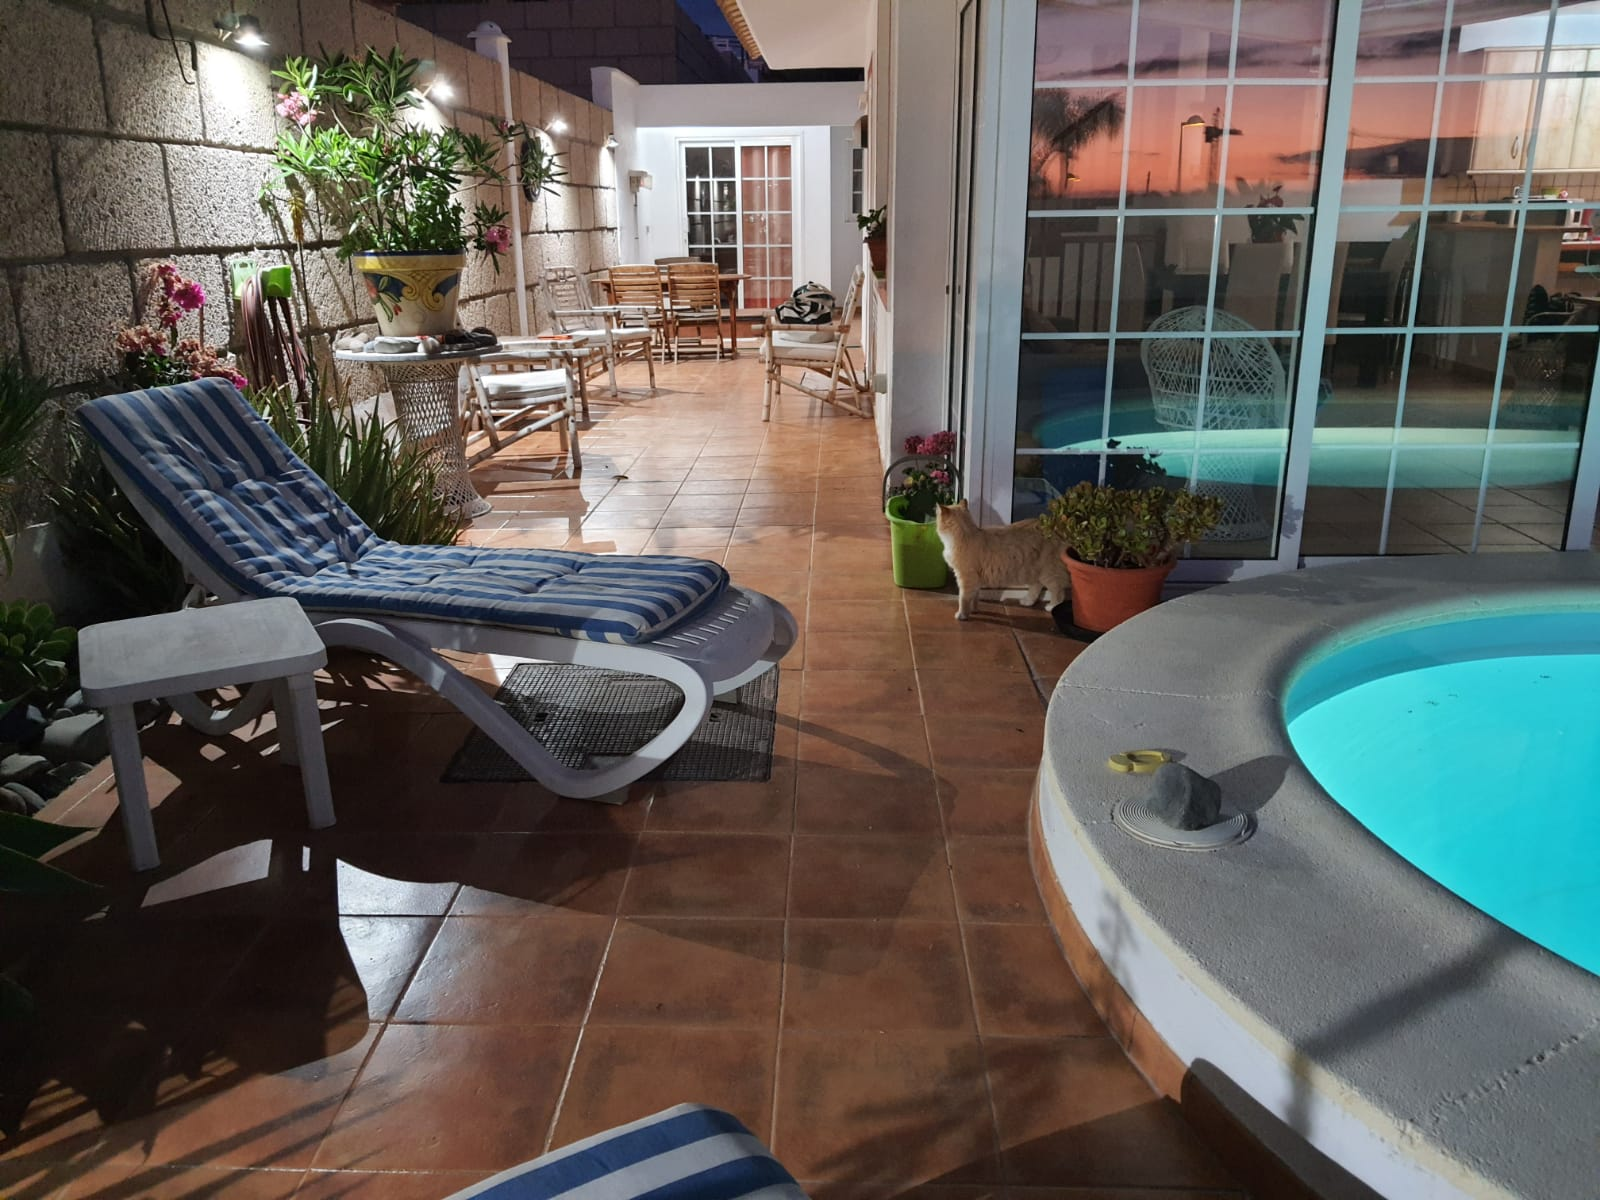 bonita casa en venta con piscina privada en pleno centro palm mar PM2028